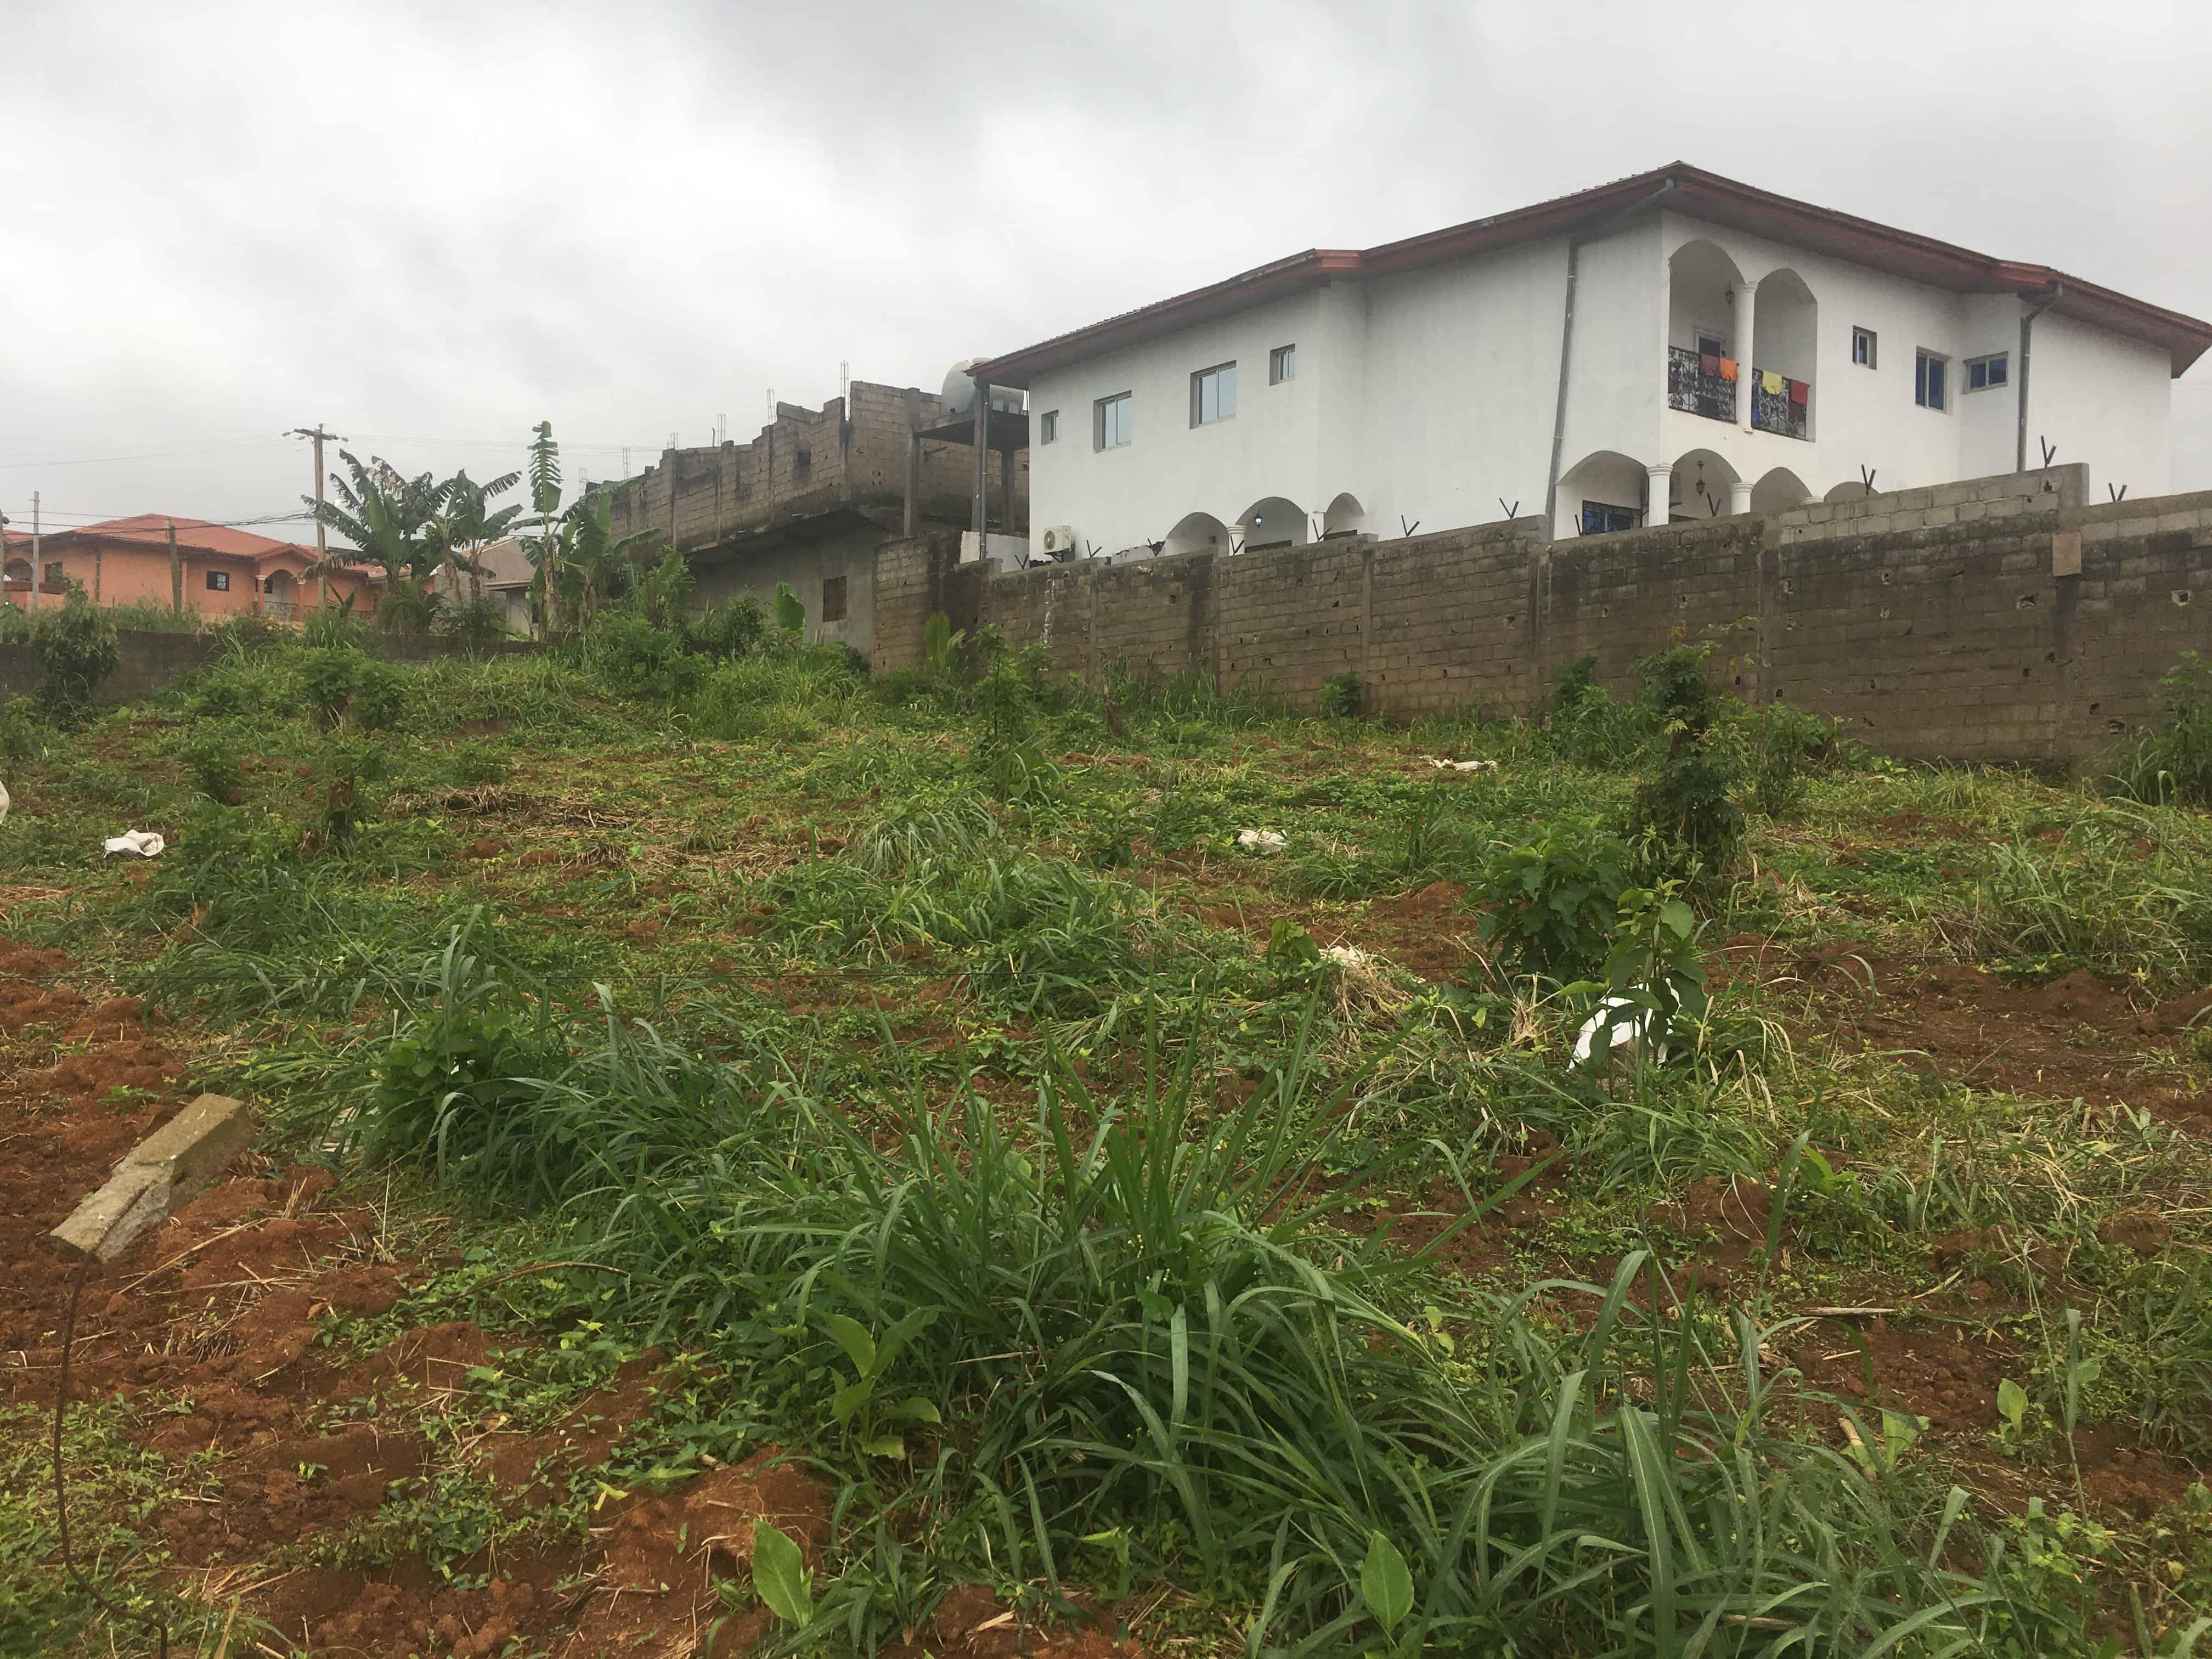 Land for sale at Yaoundé, Odza, Minkan - 1000 m2 - 30 000 000 FCFA